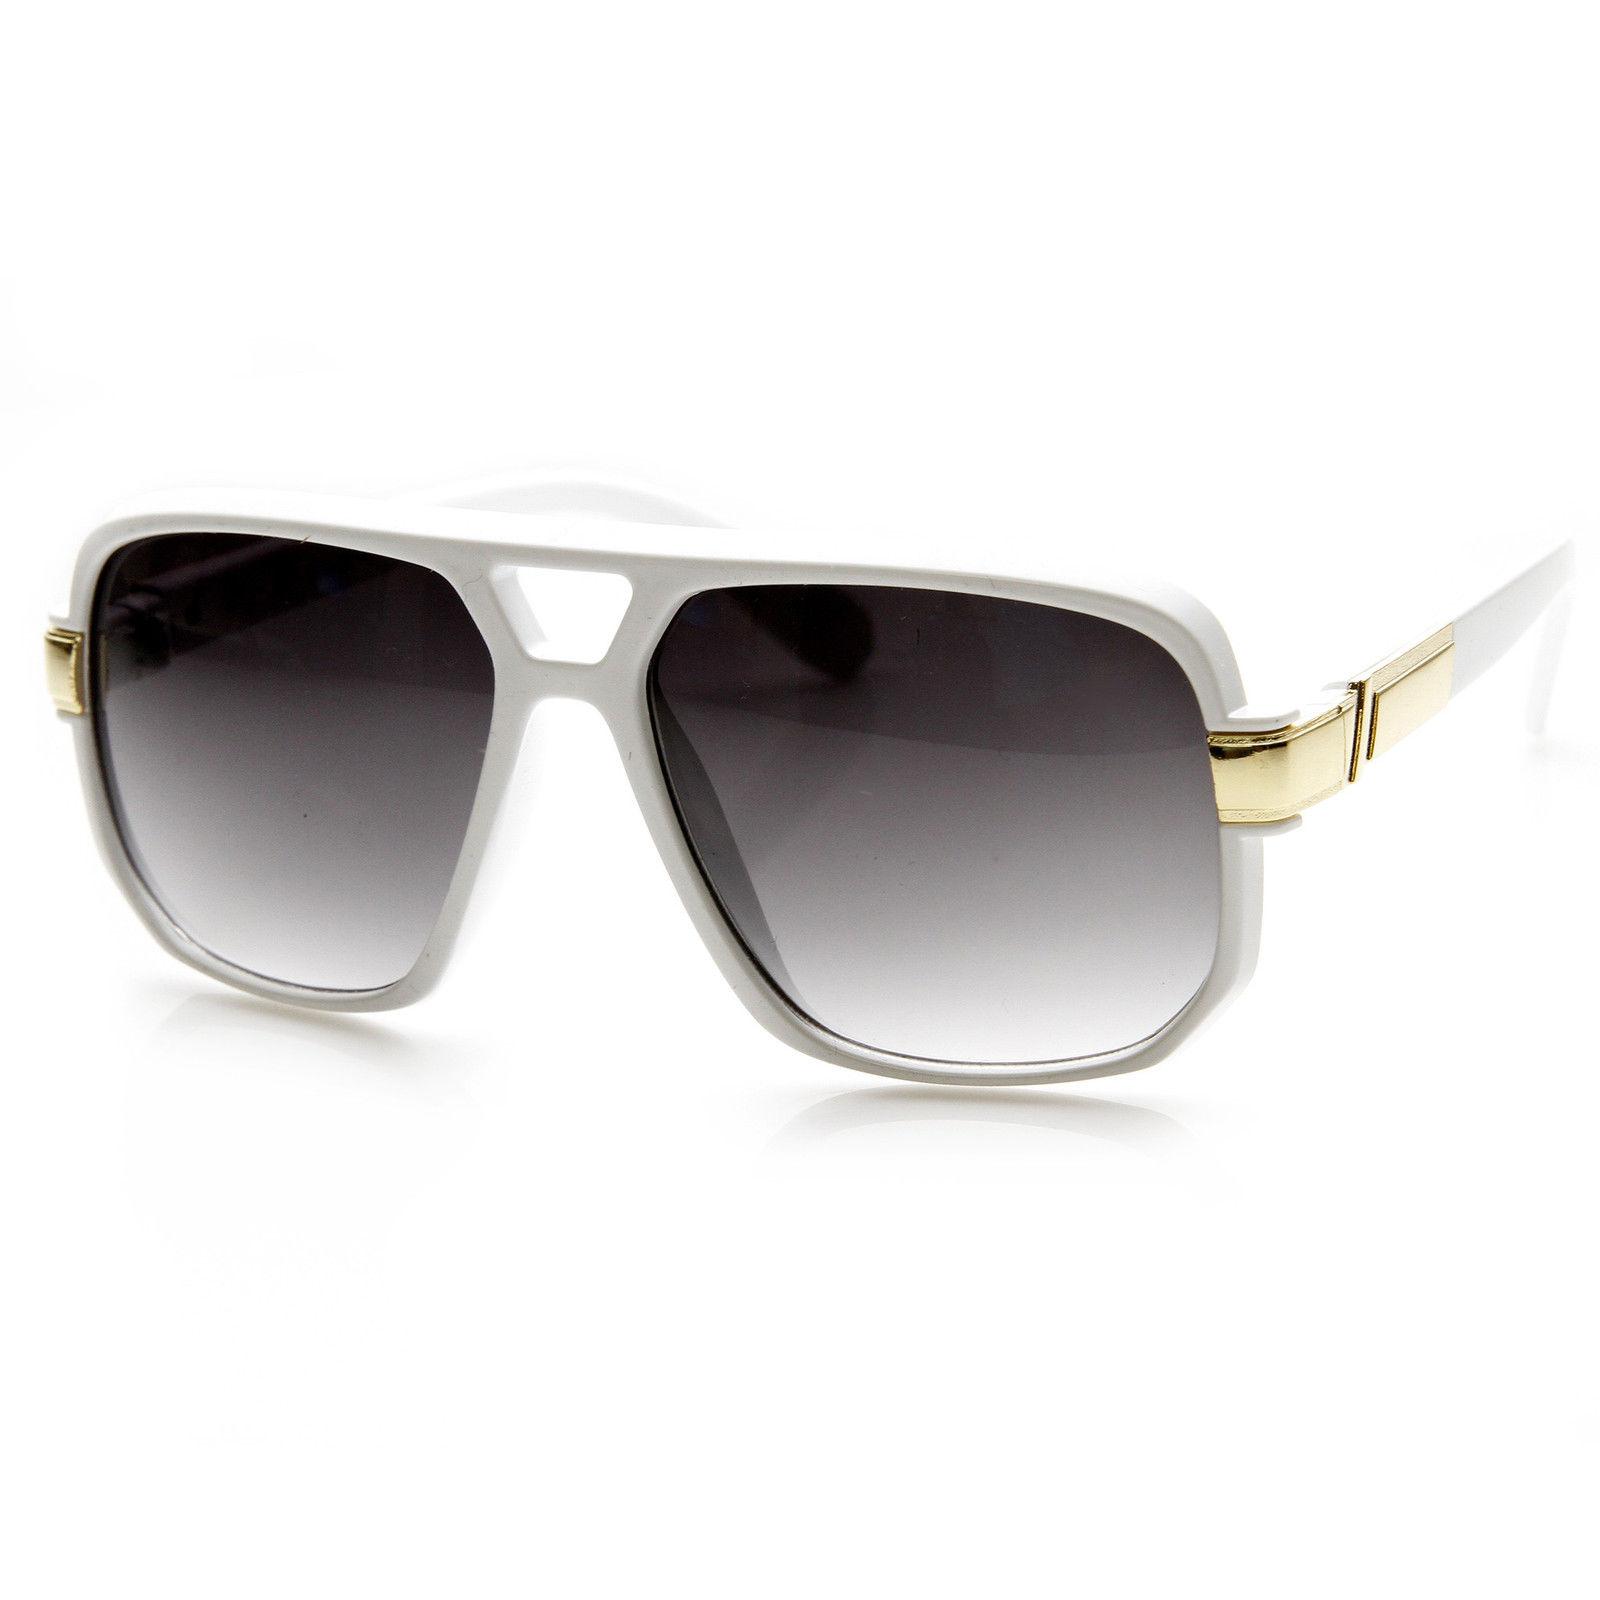 All Black Aviator Sunglasses Fsxl